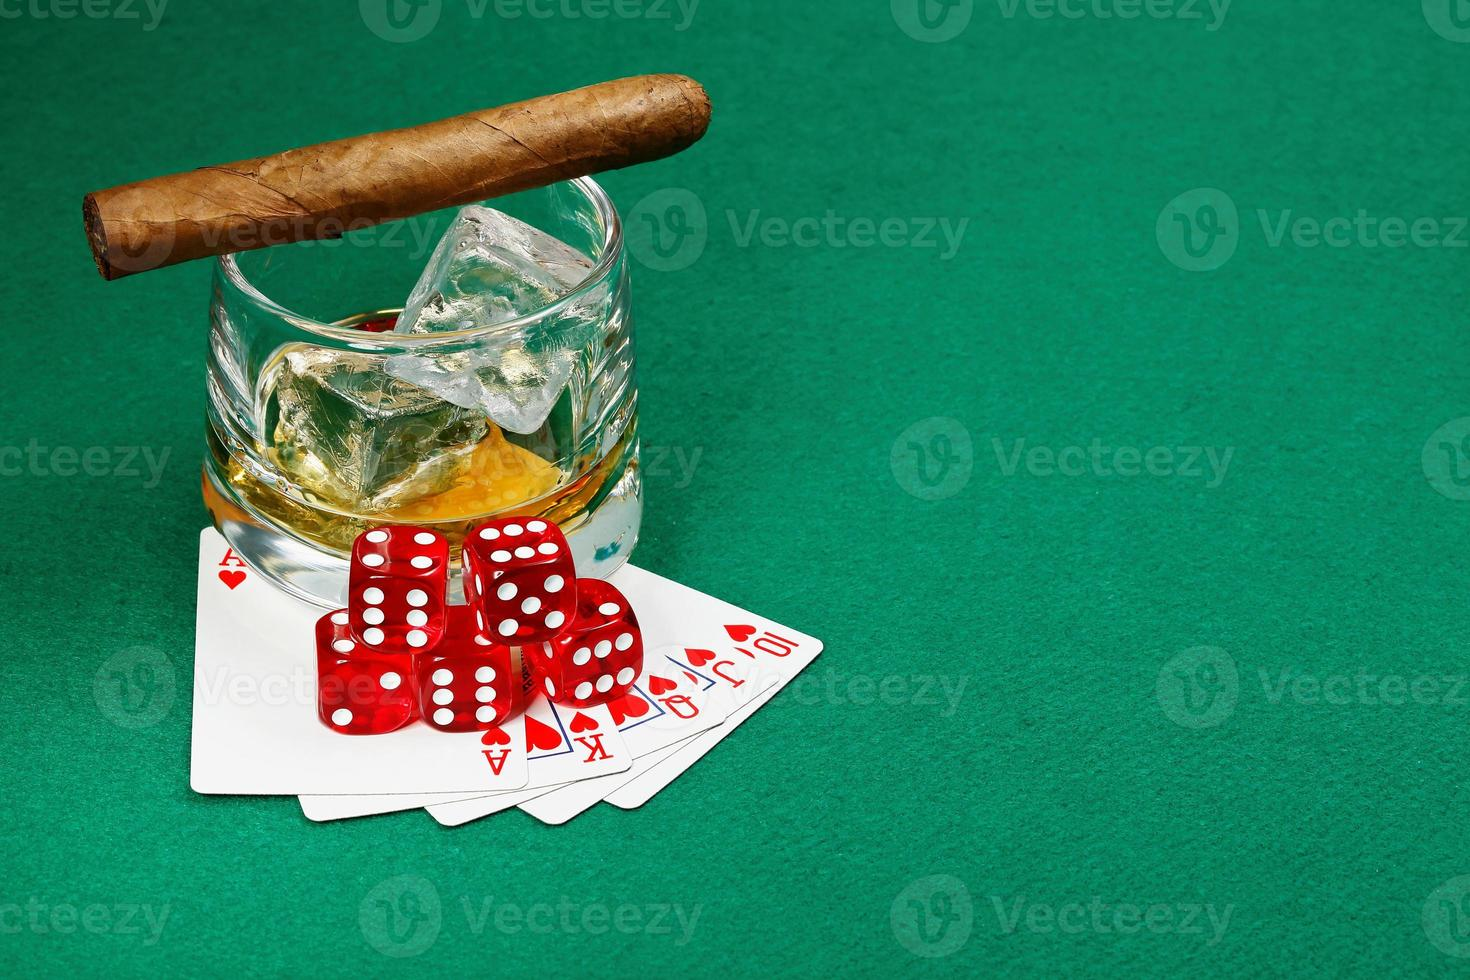 hasardspel foto